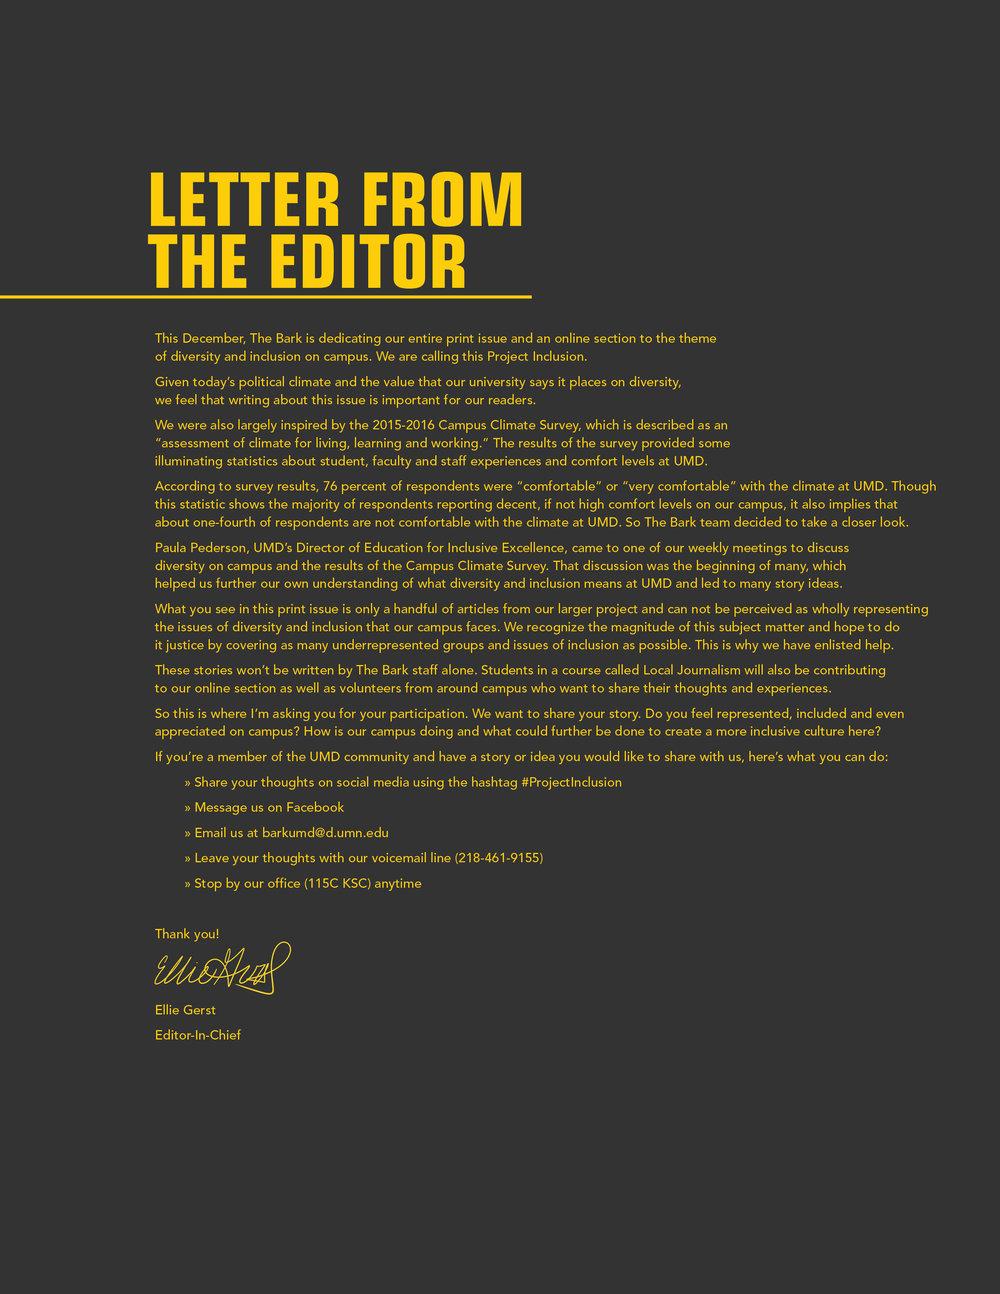 TheBark_December2017_LetterFromTheEditor_v2.jpg